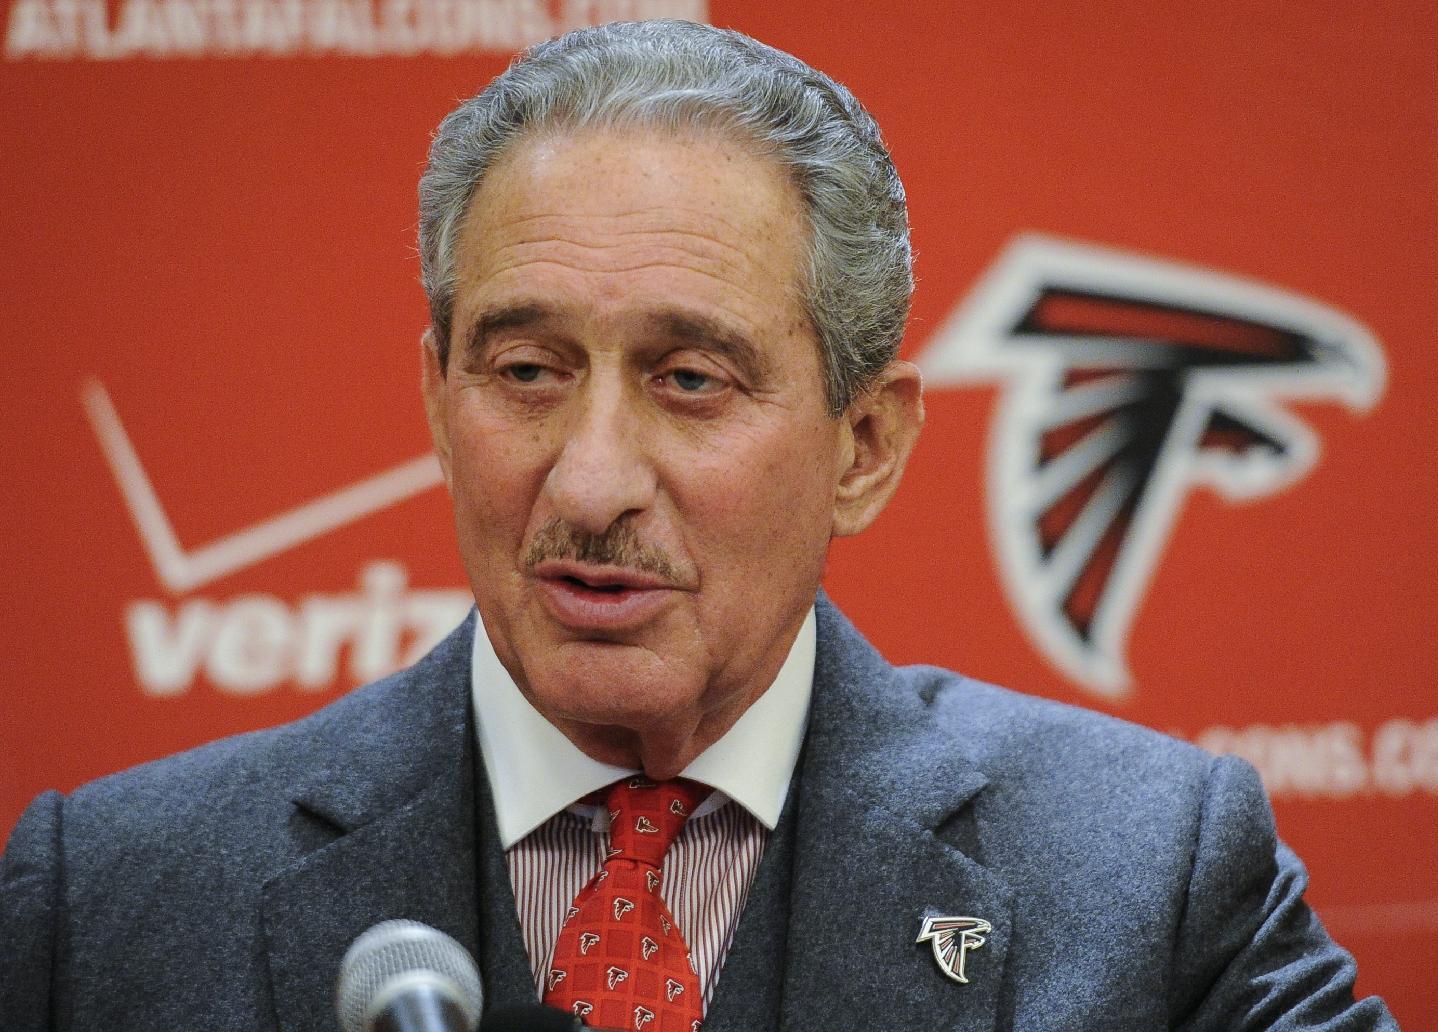 Atlanta Falcons owner & chairman Arthur Blank during an end of season press conference on Monday, Jan. 6, 2014, in Atlanta